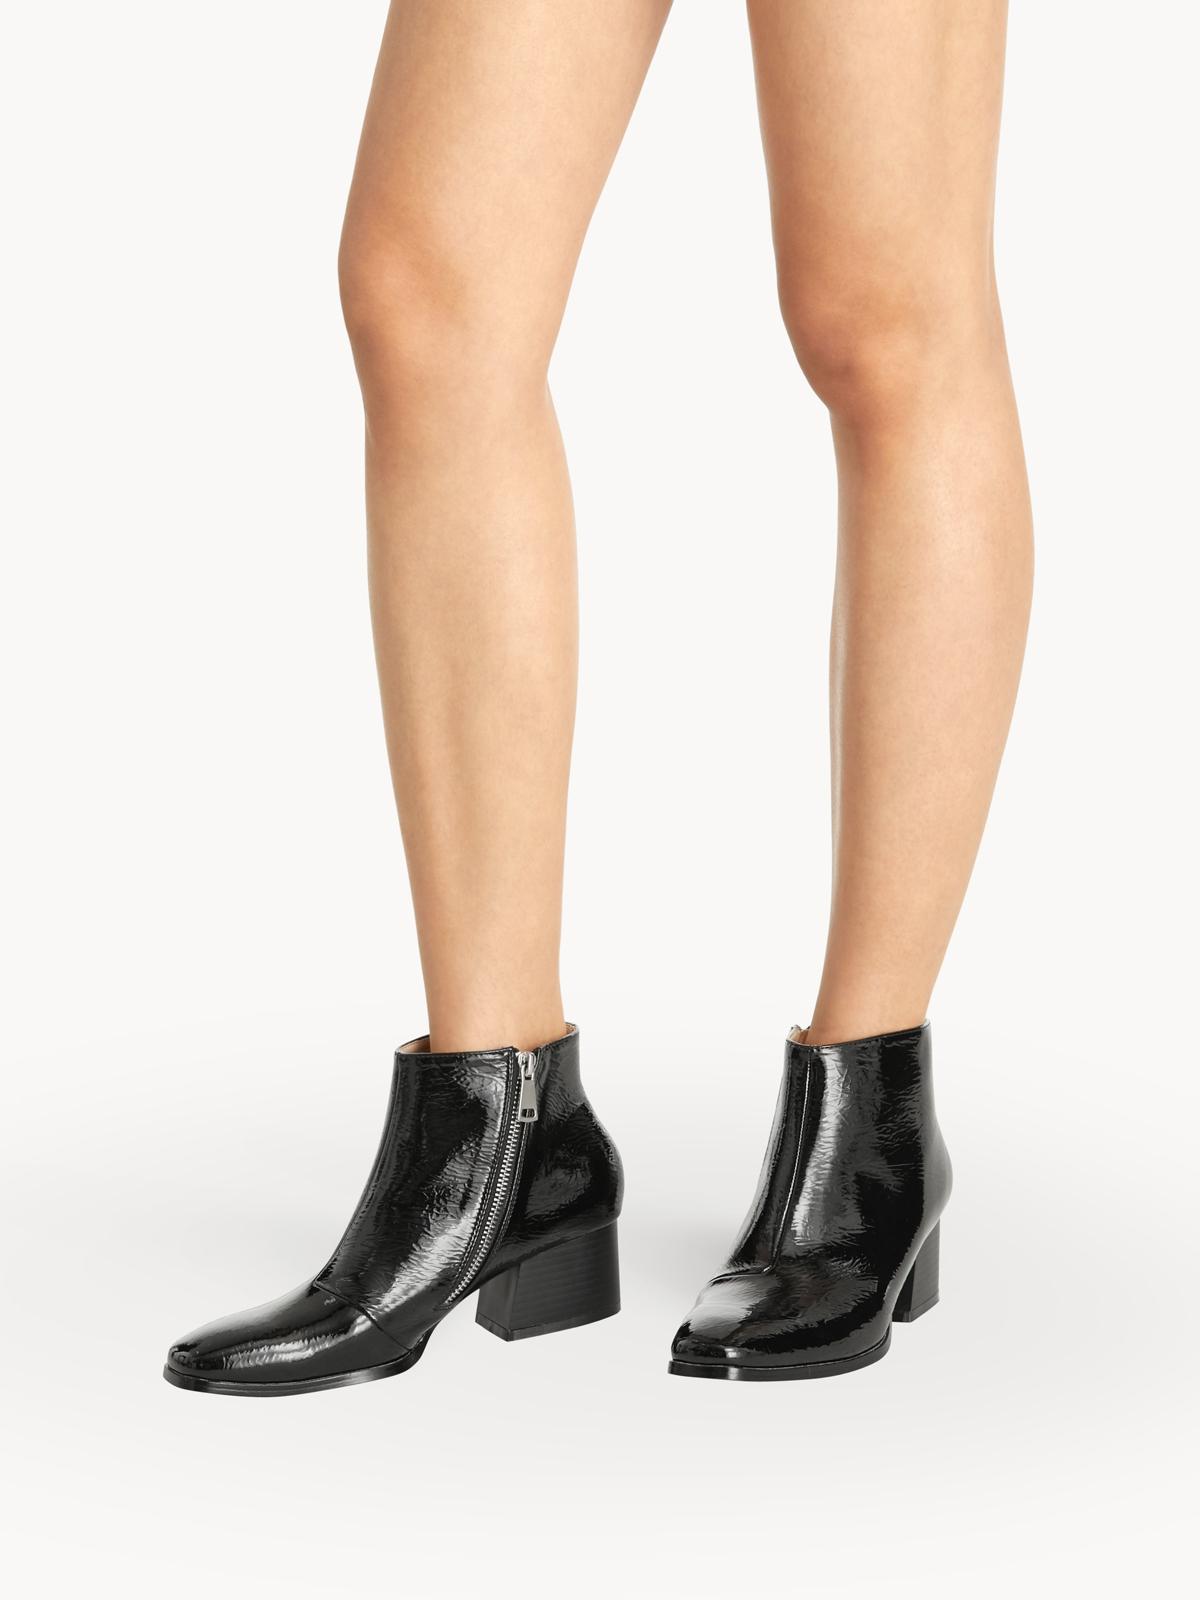 Starkela Classic Mid Round Boots Black